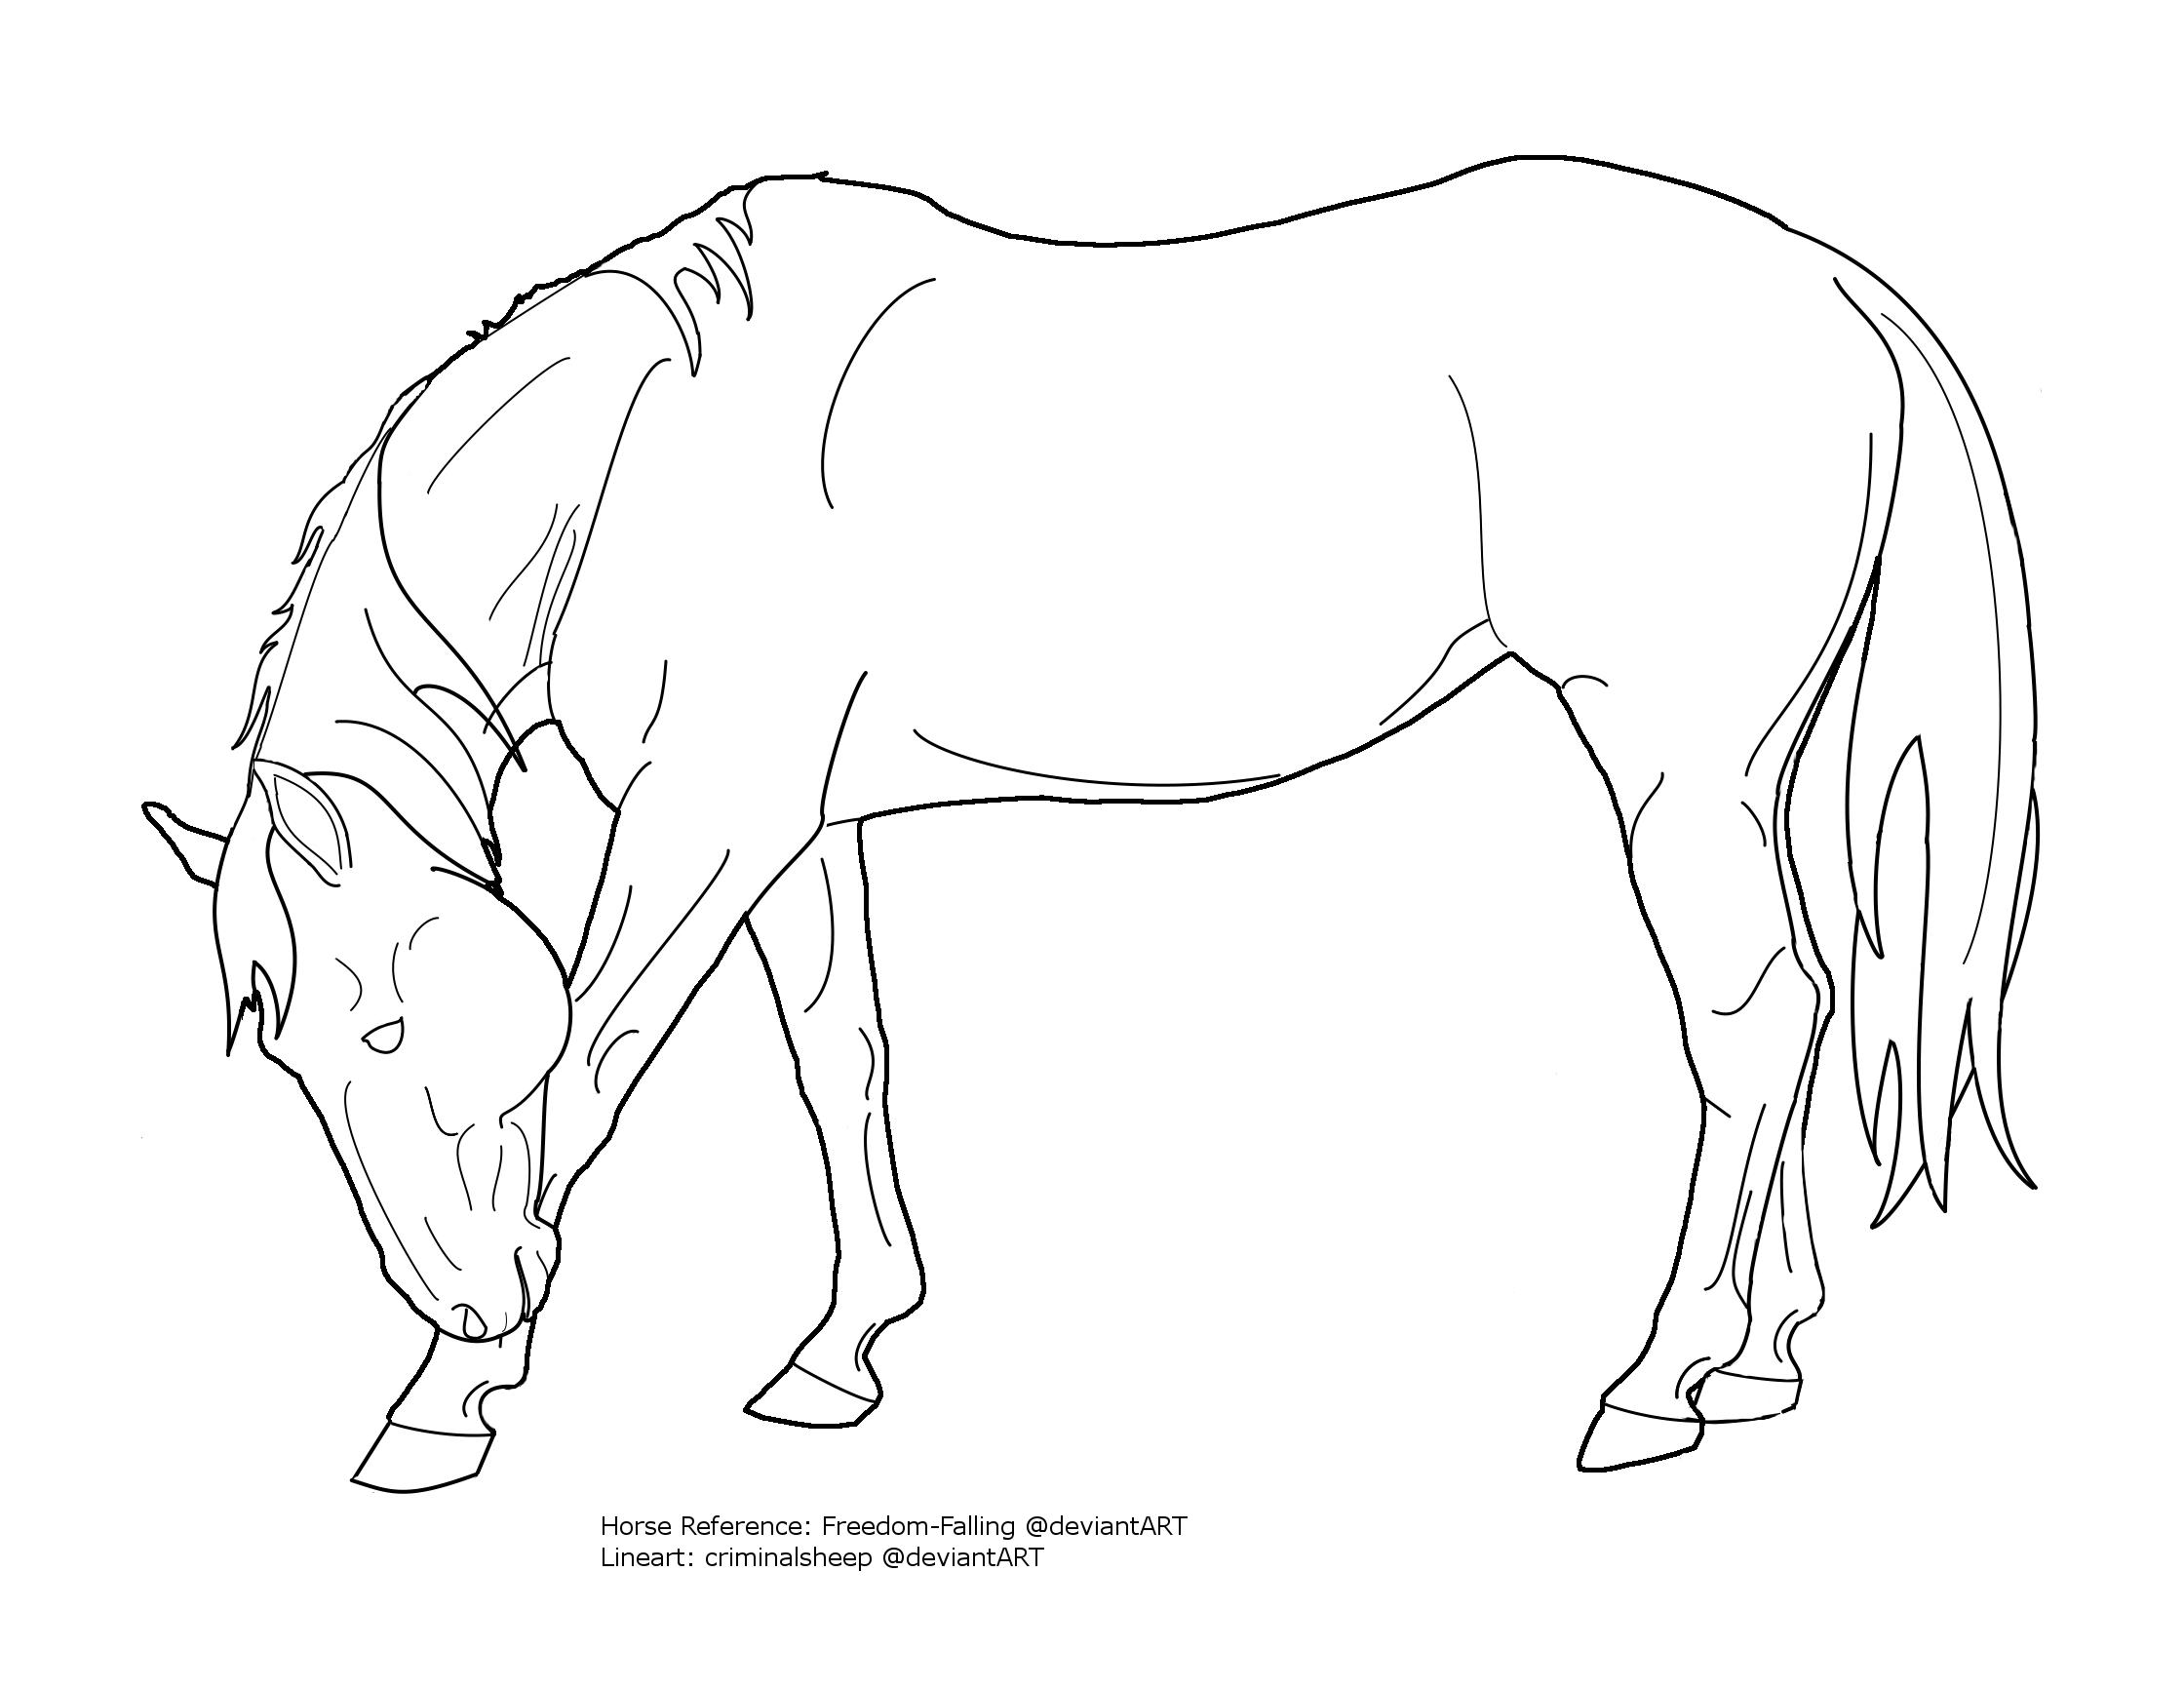 Line Art Horse : Bowing horse lineart by criminalsheep on deviantart